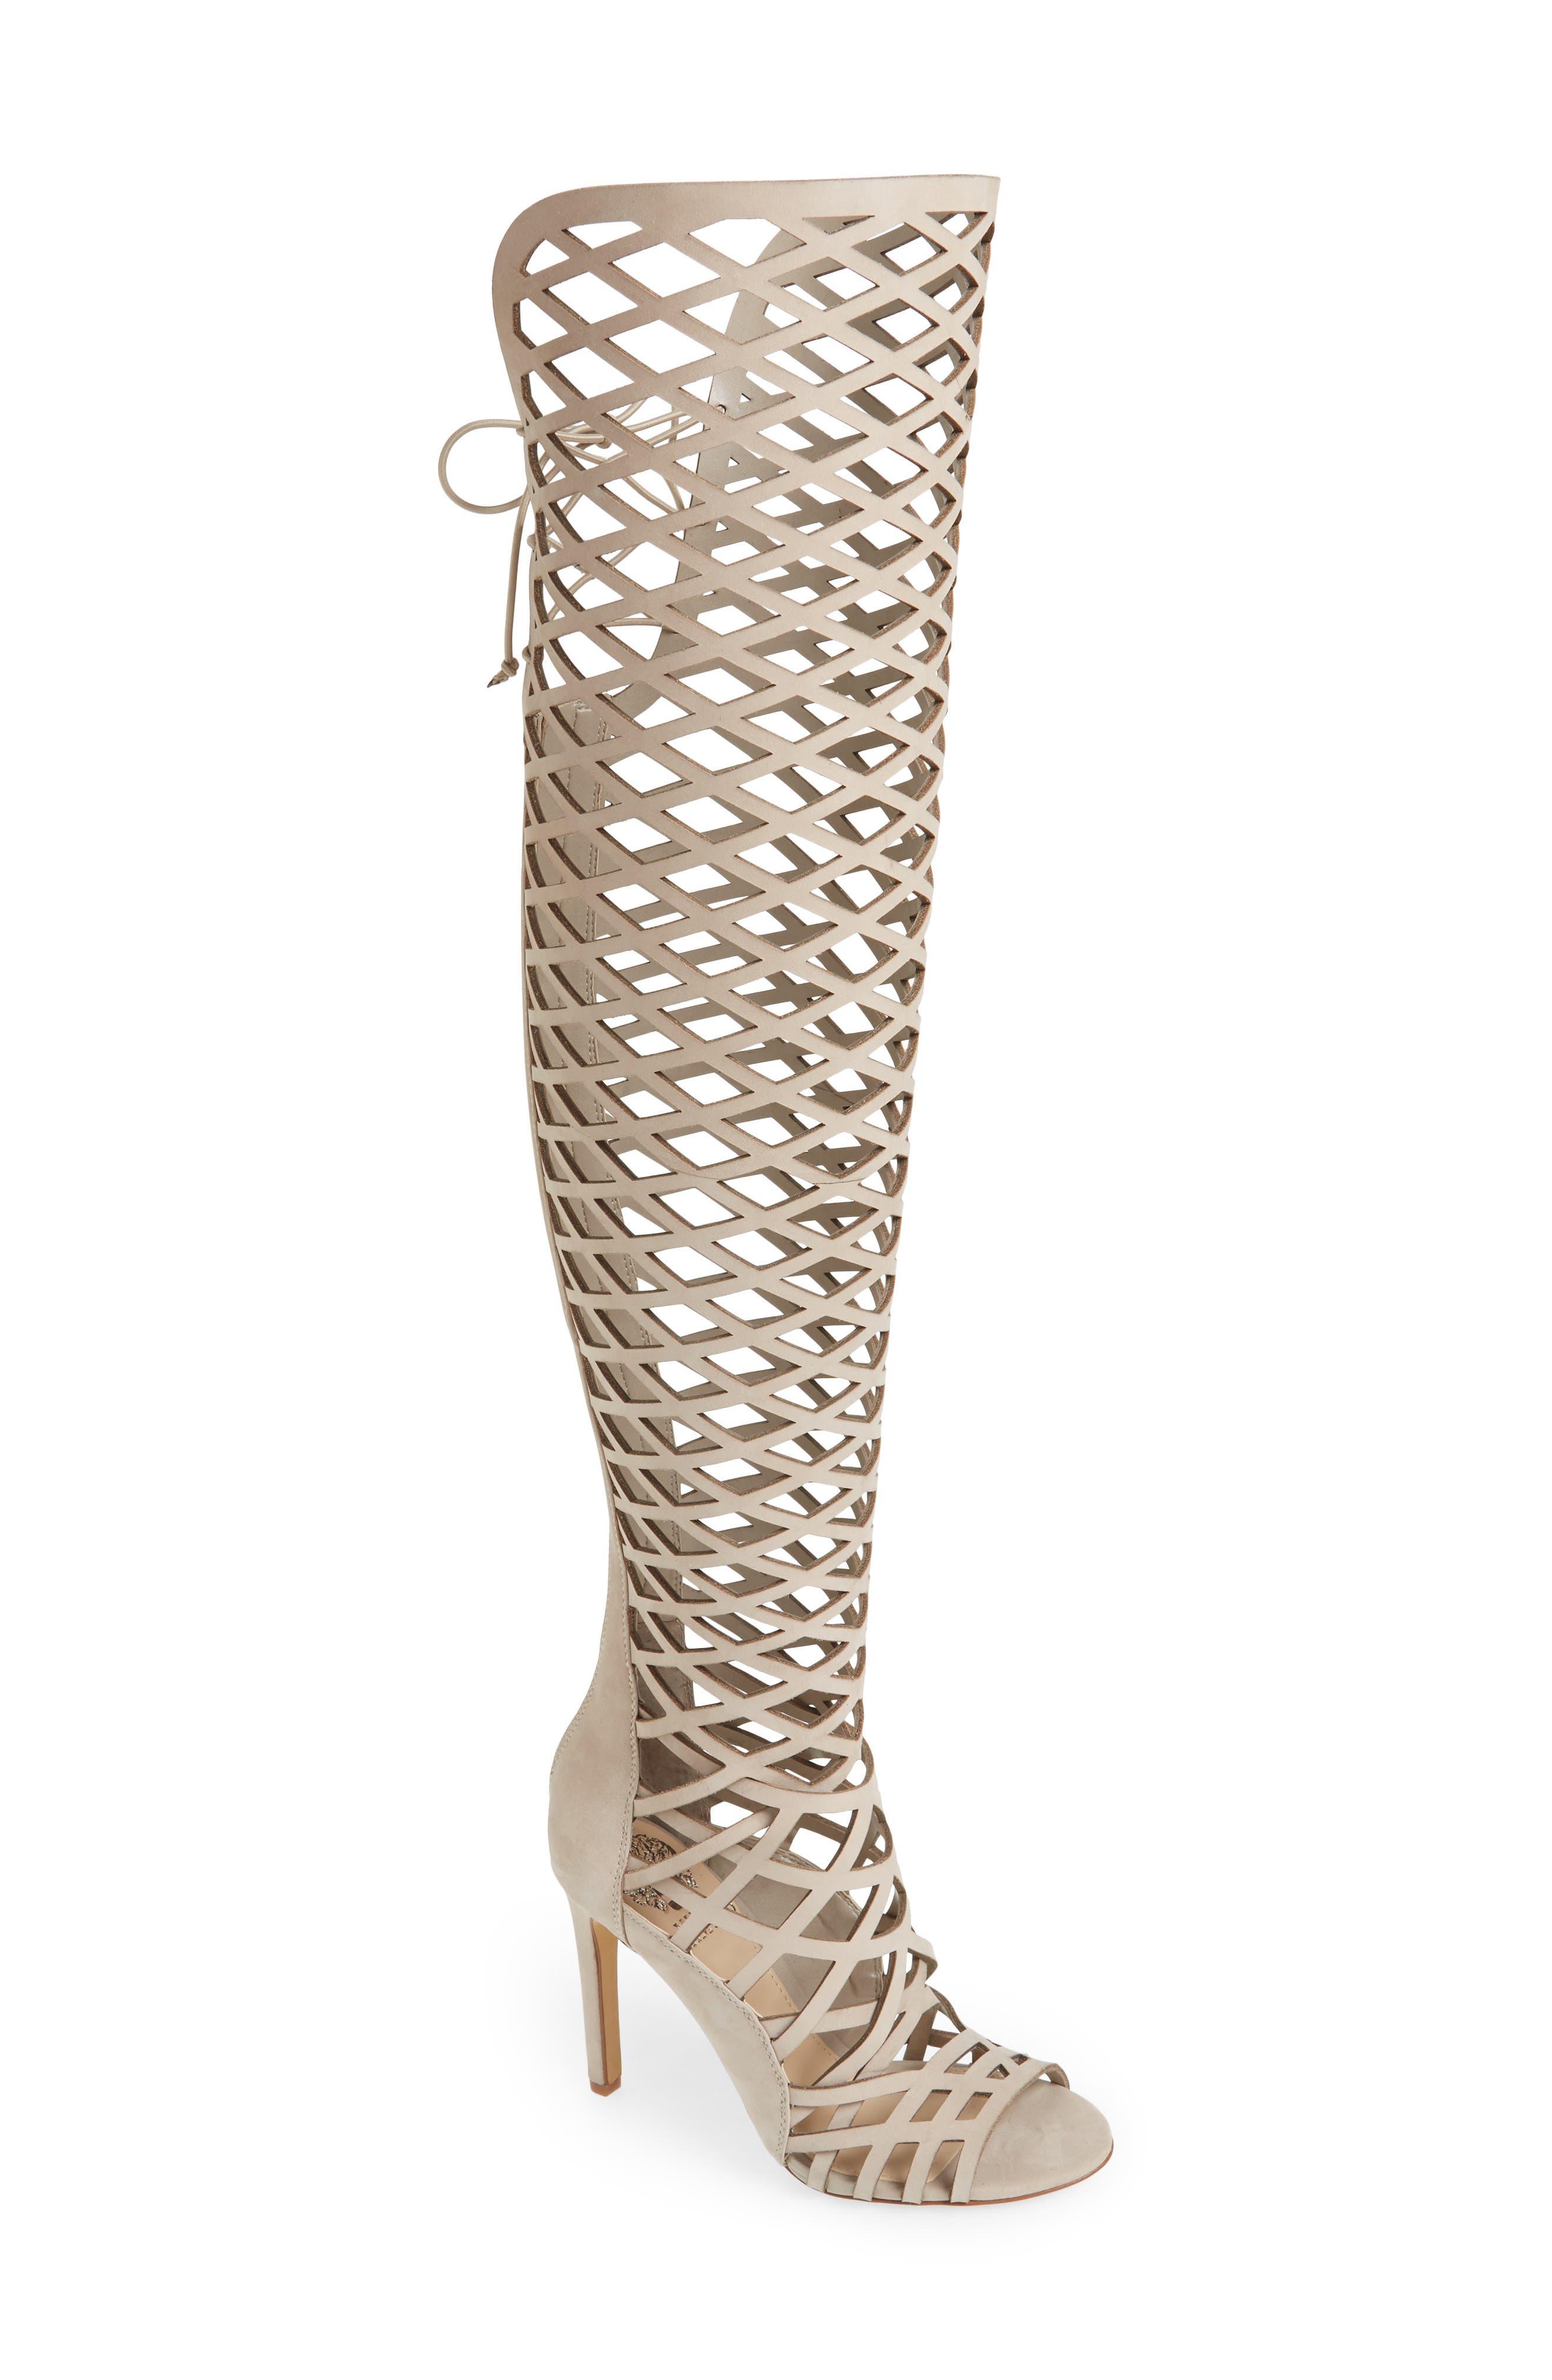 Alternate Image 1 Selected - Vince Camuto 'Keliana' Over the Knee Boot (Women)